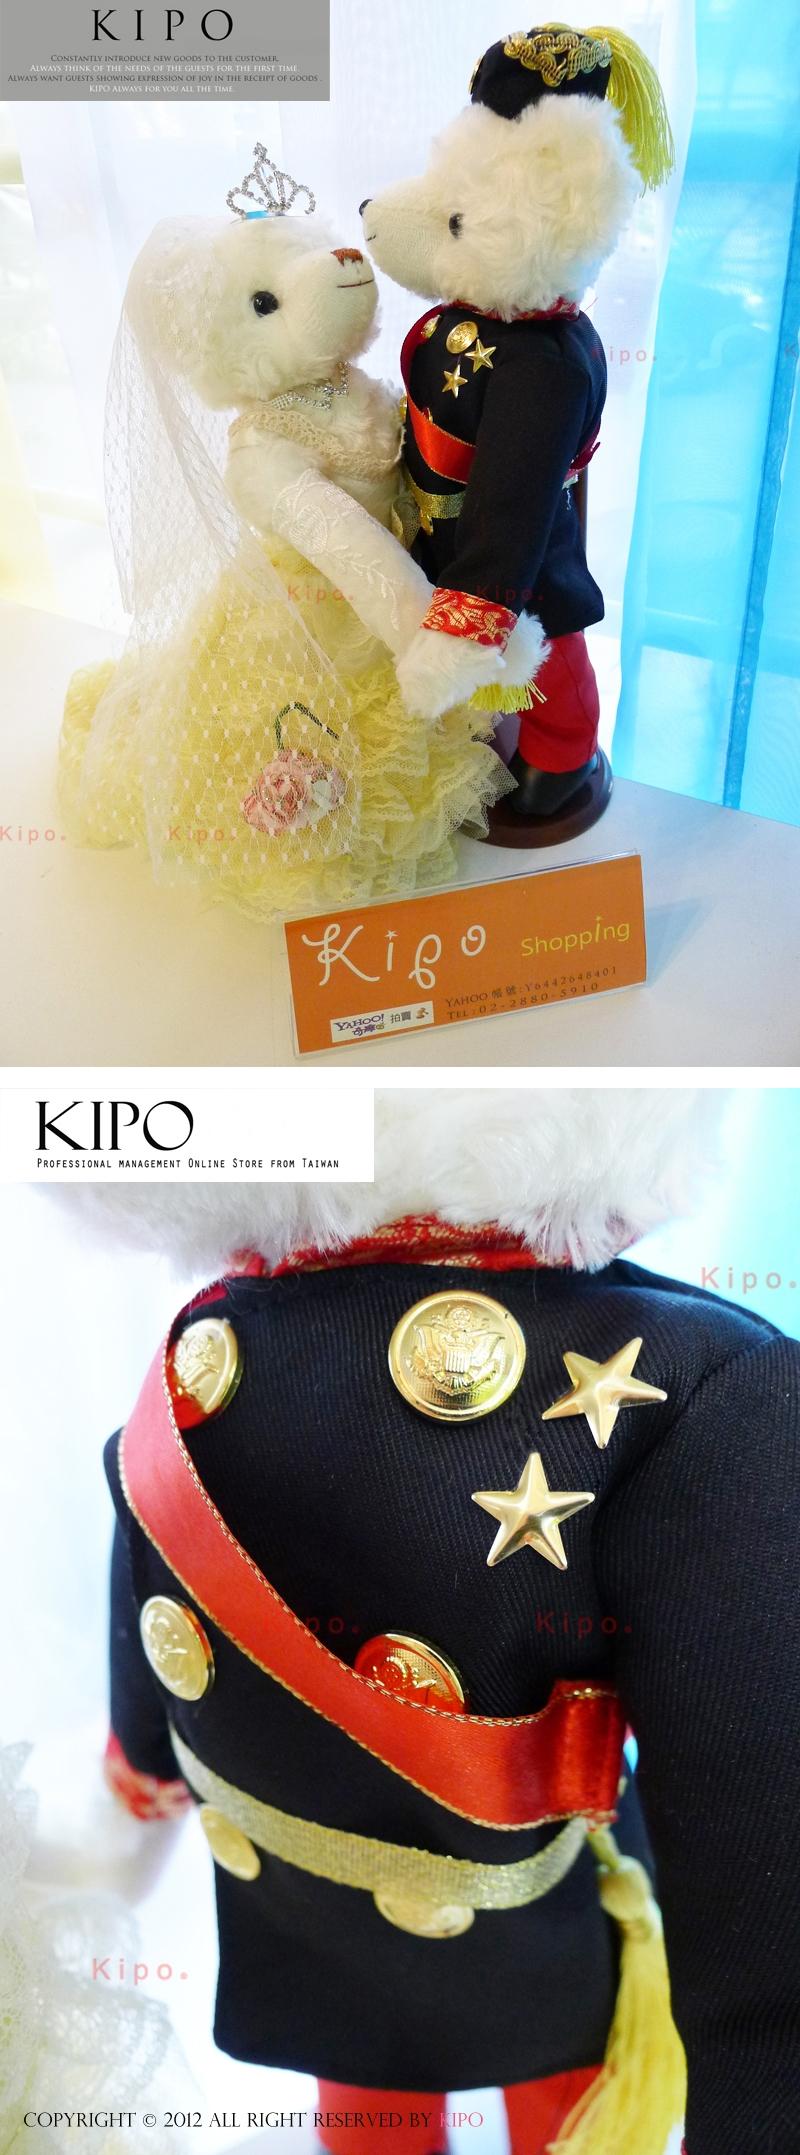 http://www.kipo.com.tw/EDM/buyimage/NCJ008092A/p2.jpg